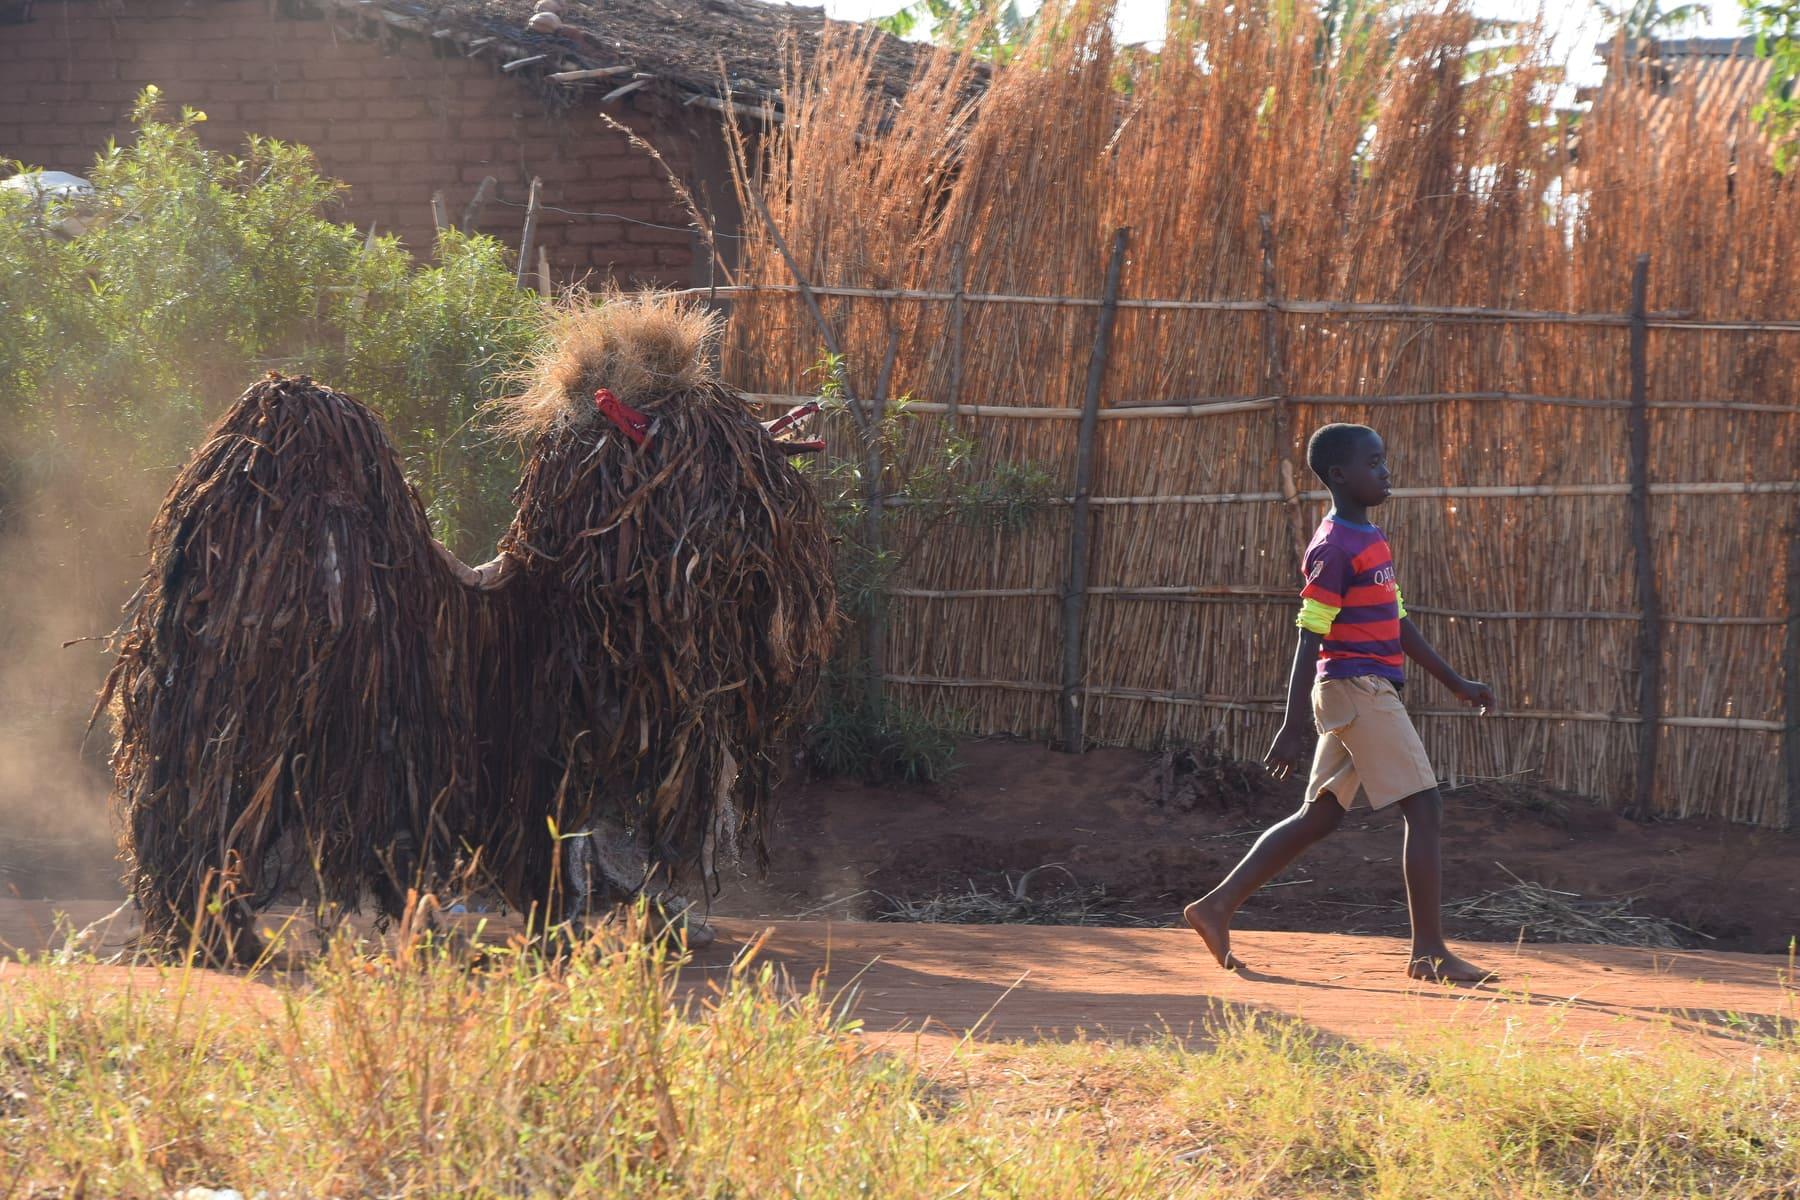 Gule Wamkulu - the sacred dance and masks of the Chewa people, Malawi 9